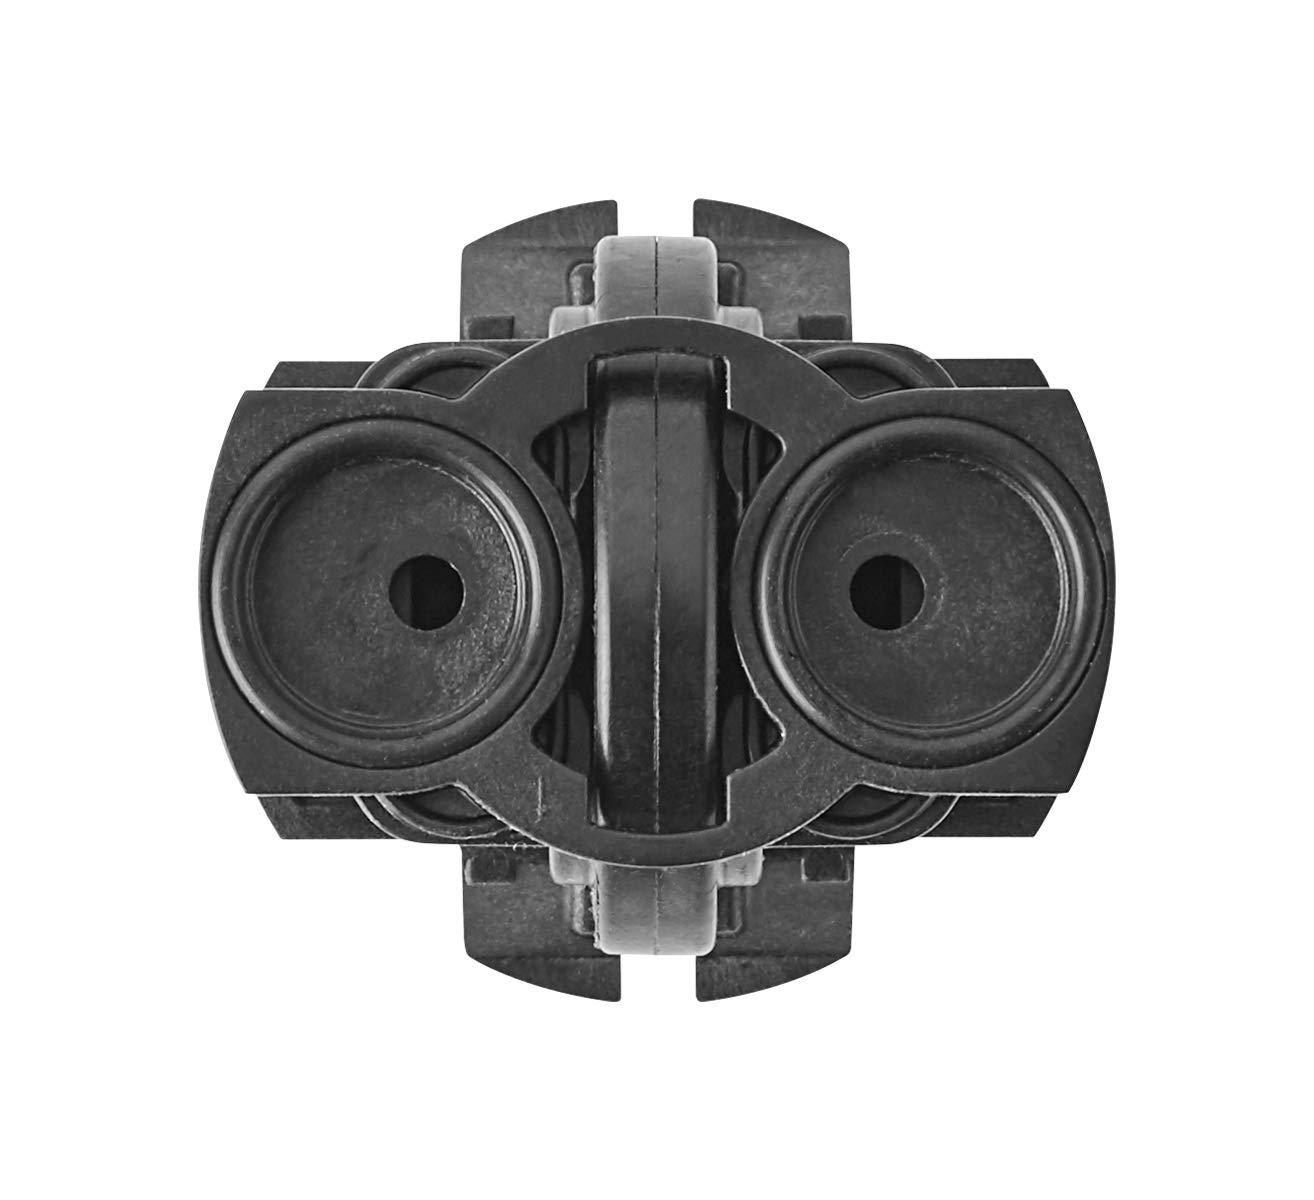 Kohler Part GP800820 Rite-Temp Pressure-Balancing Unit Cartridge, Black by Kohler (Image #5)